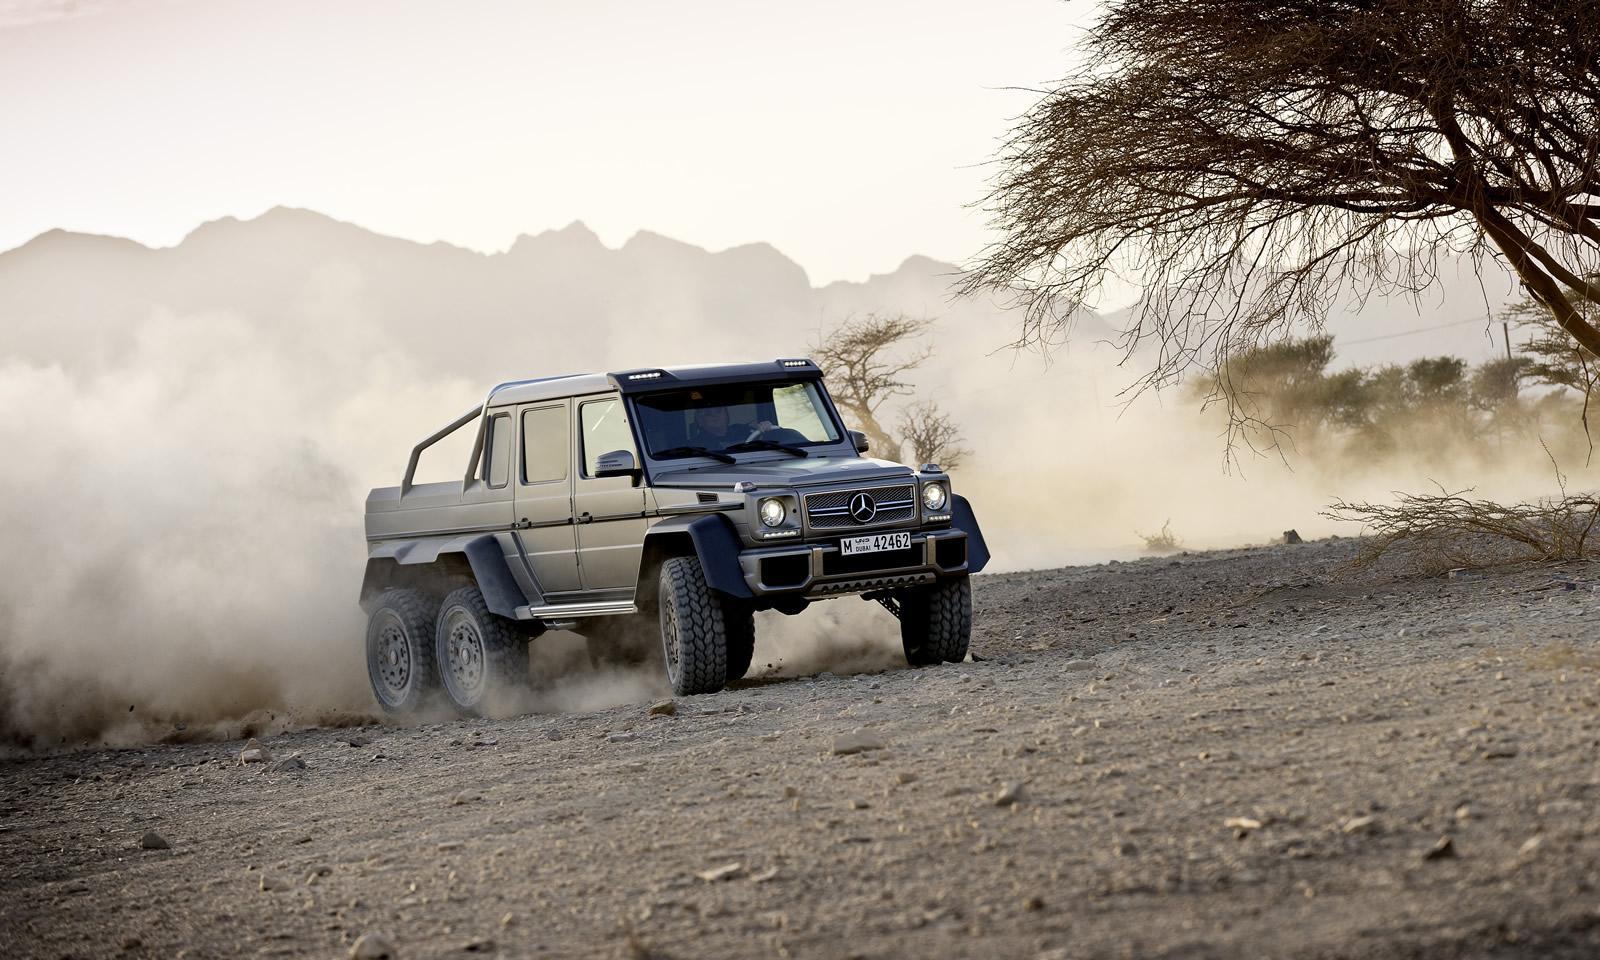 6x6 mercedes benz g63 amg pics aplenty autoevolution for Mercedes benz amg 6x6 price